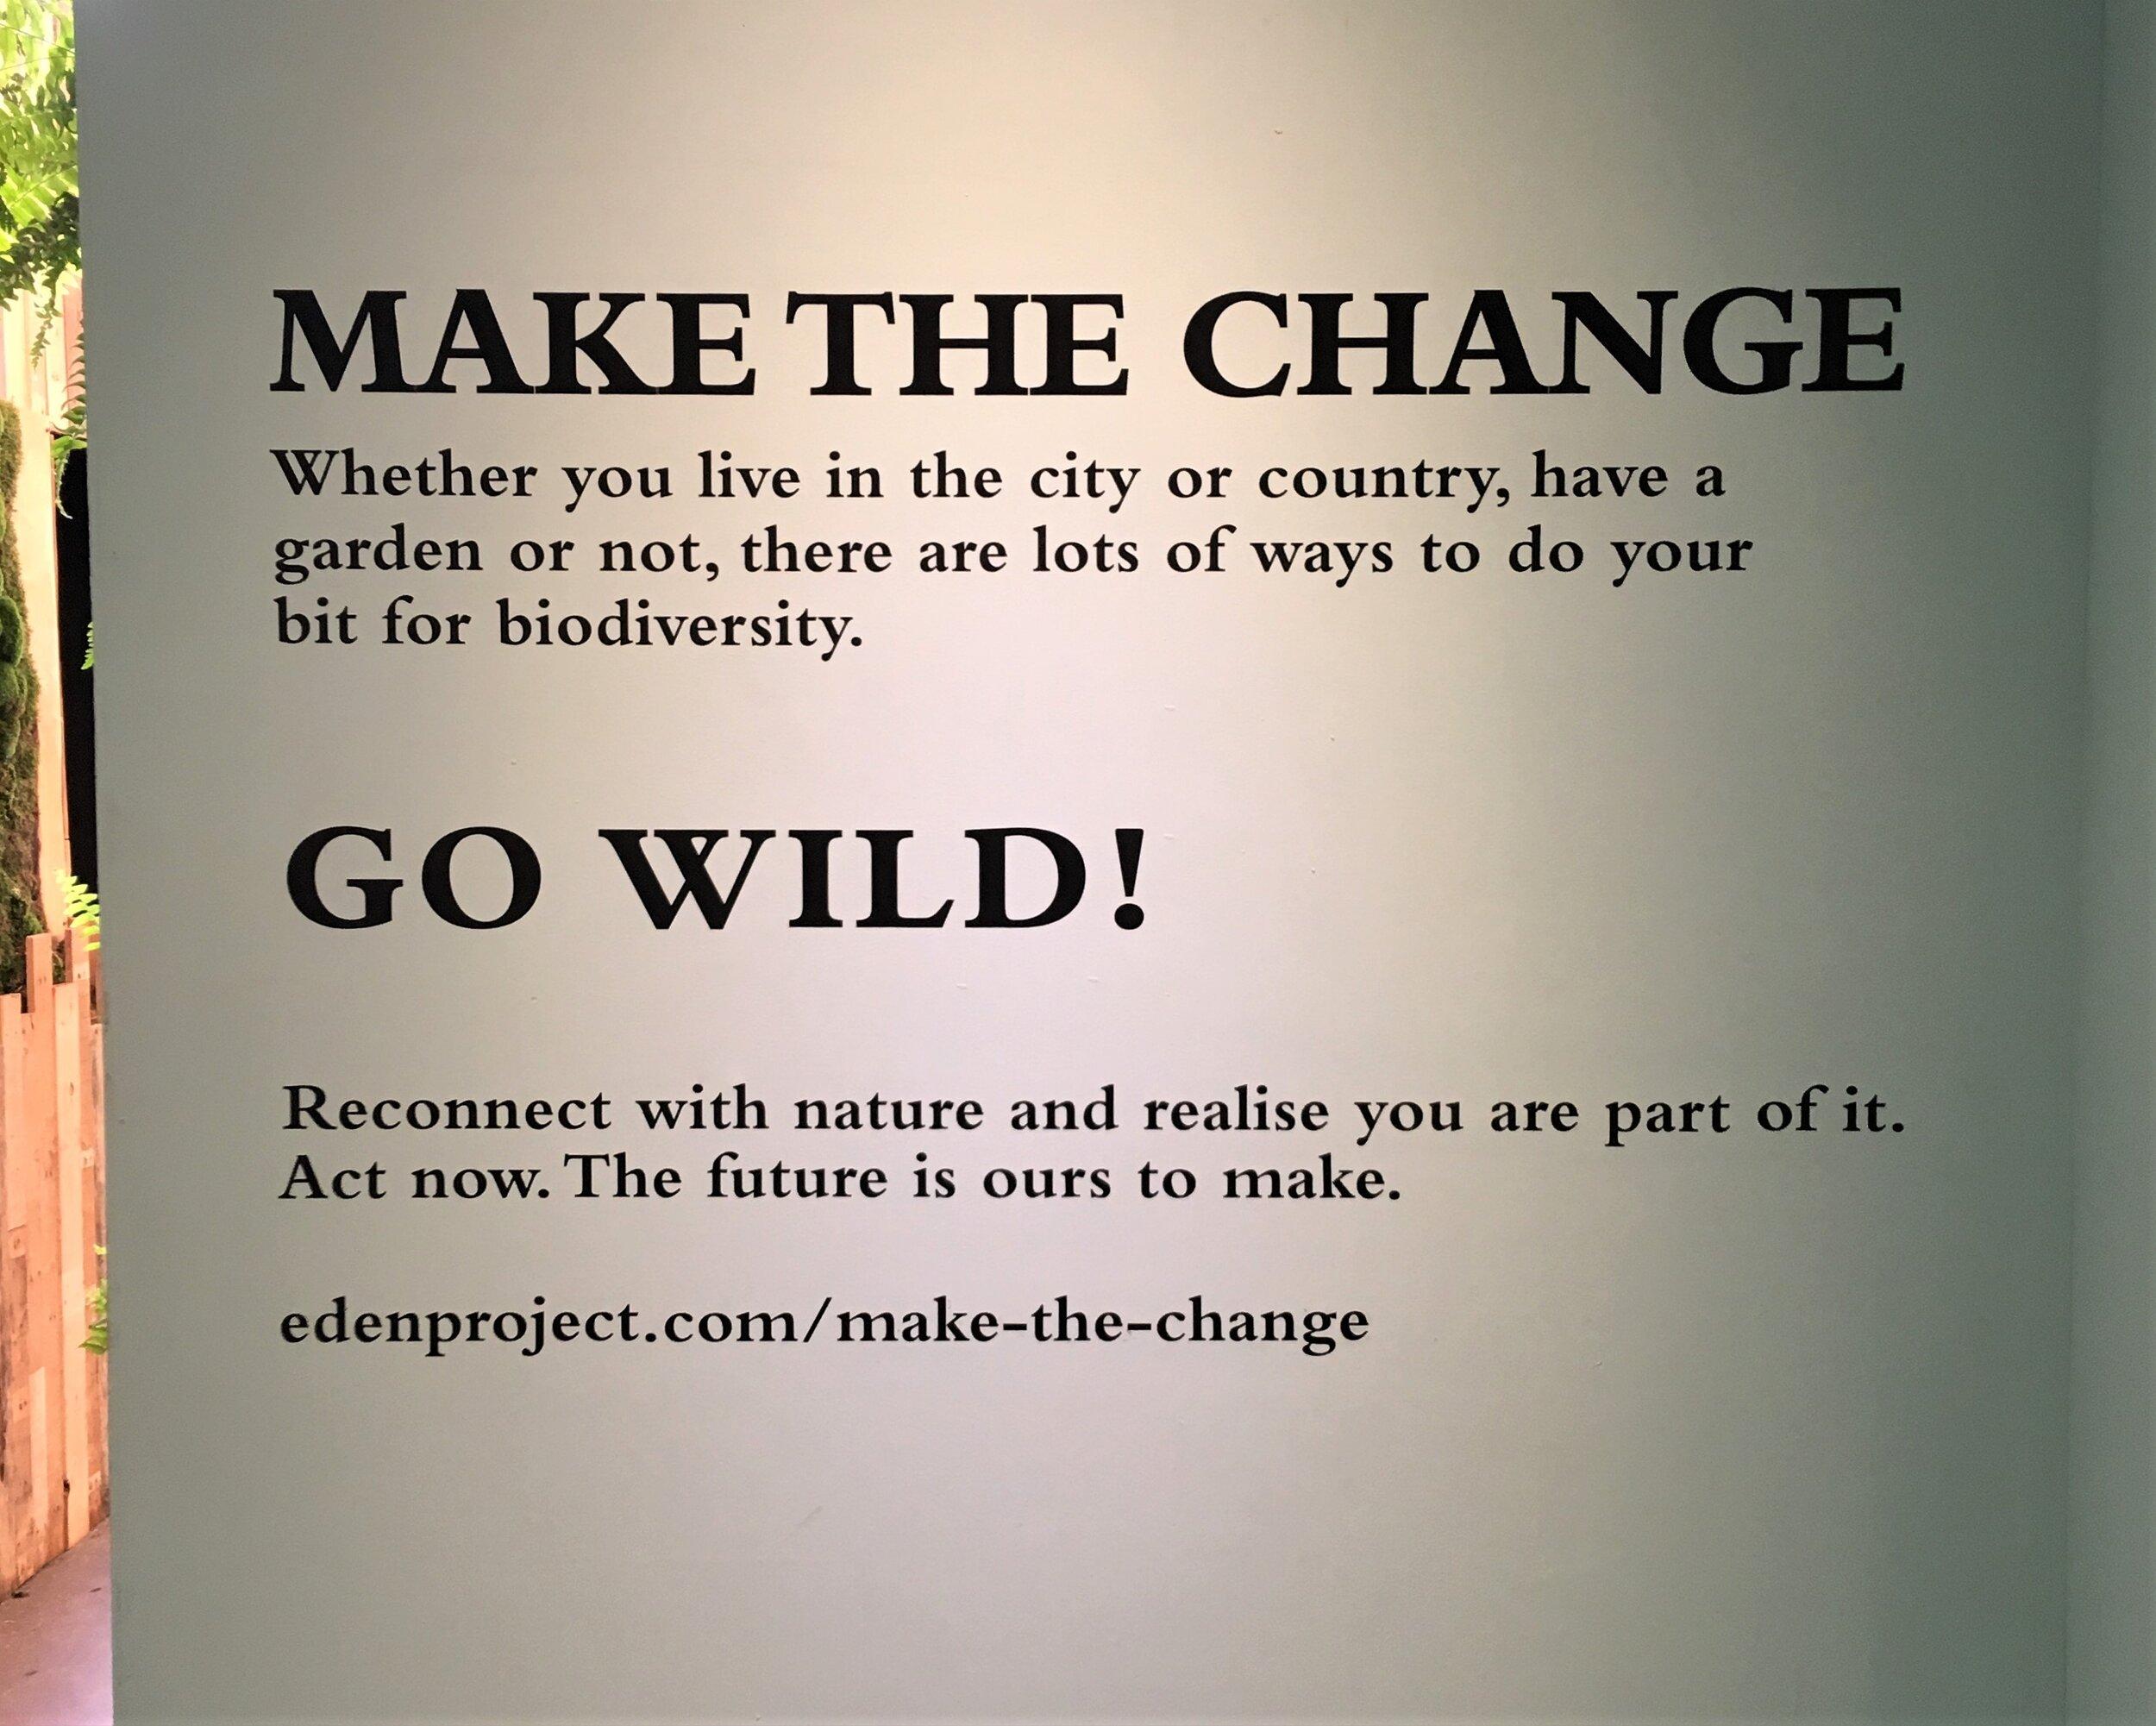 make the change.jpg